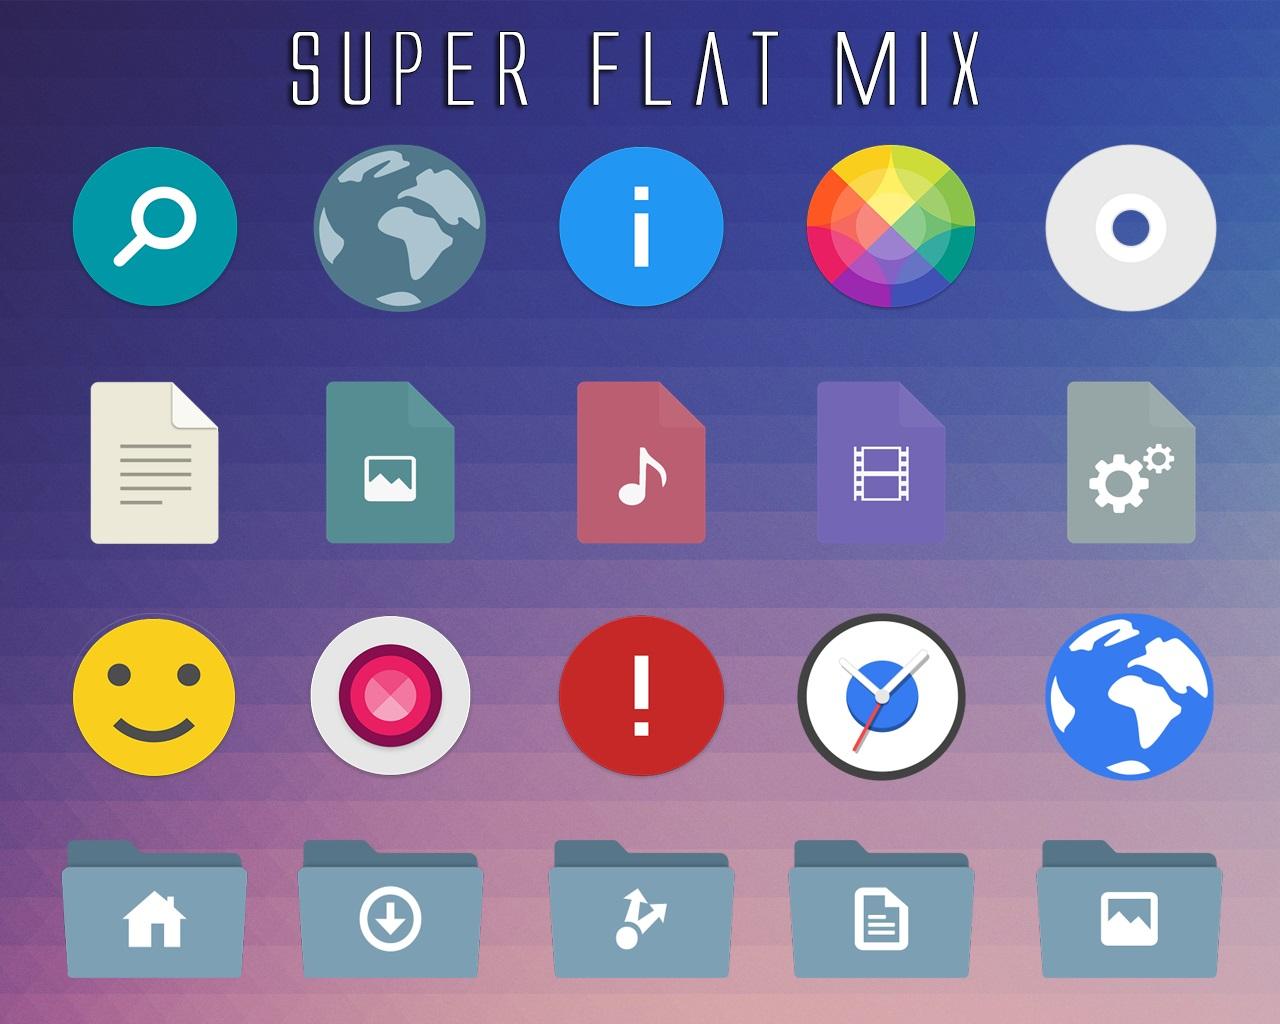 Windows Customs: Super Flat Mix